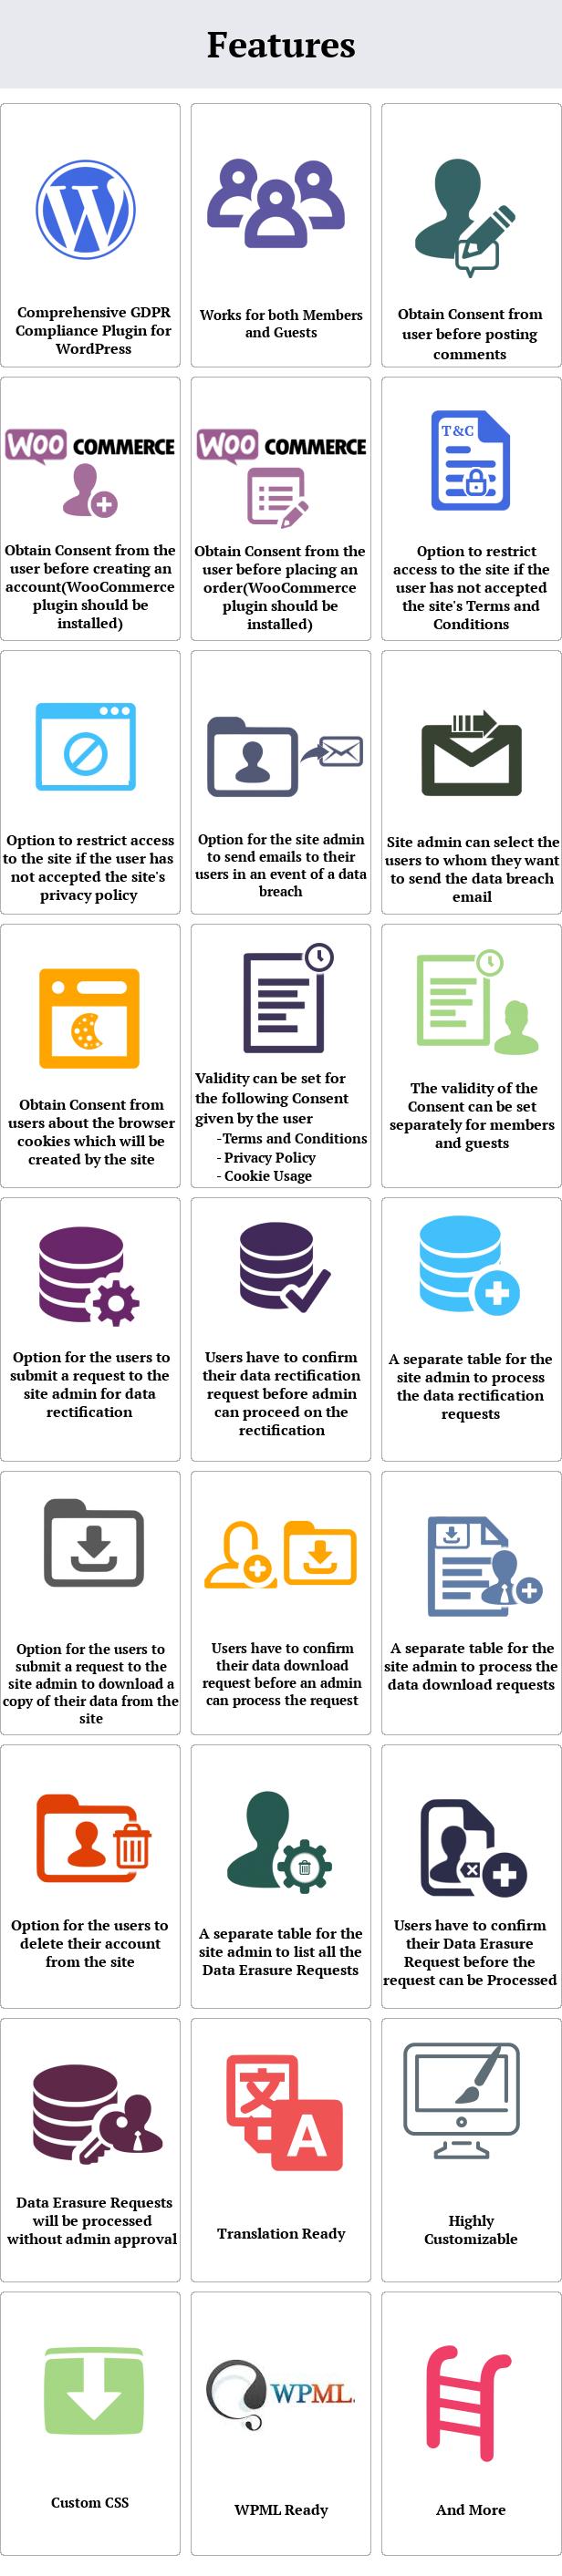 gdpr-complaince-suite_feature_-infographics_image